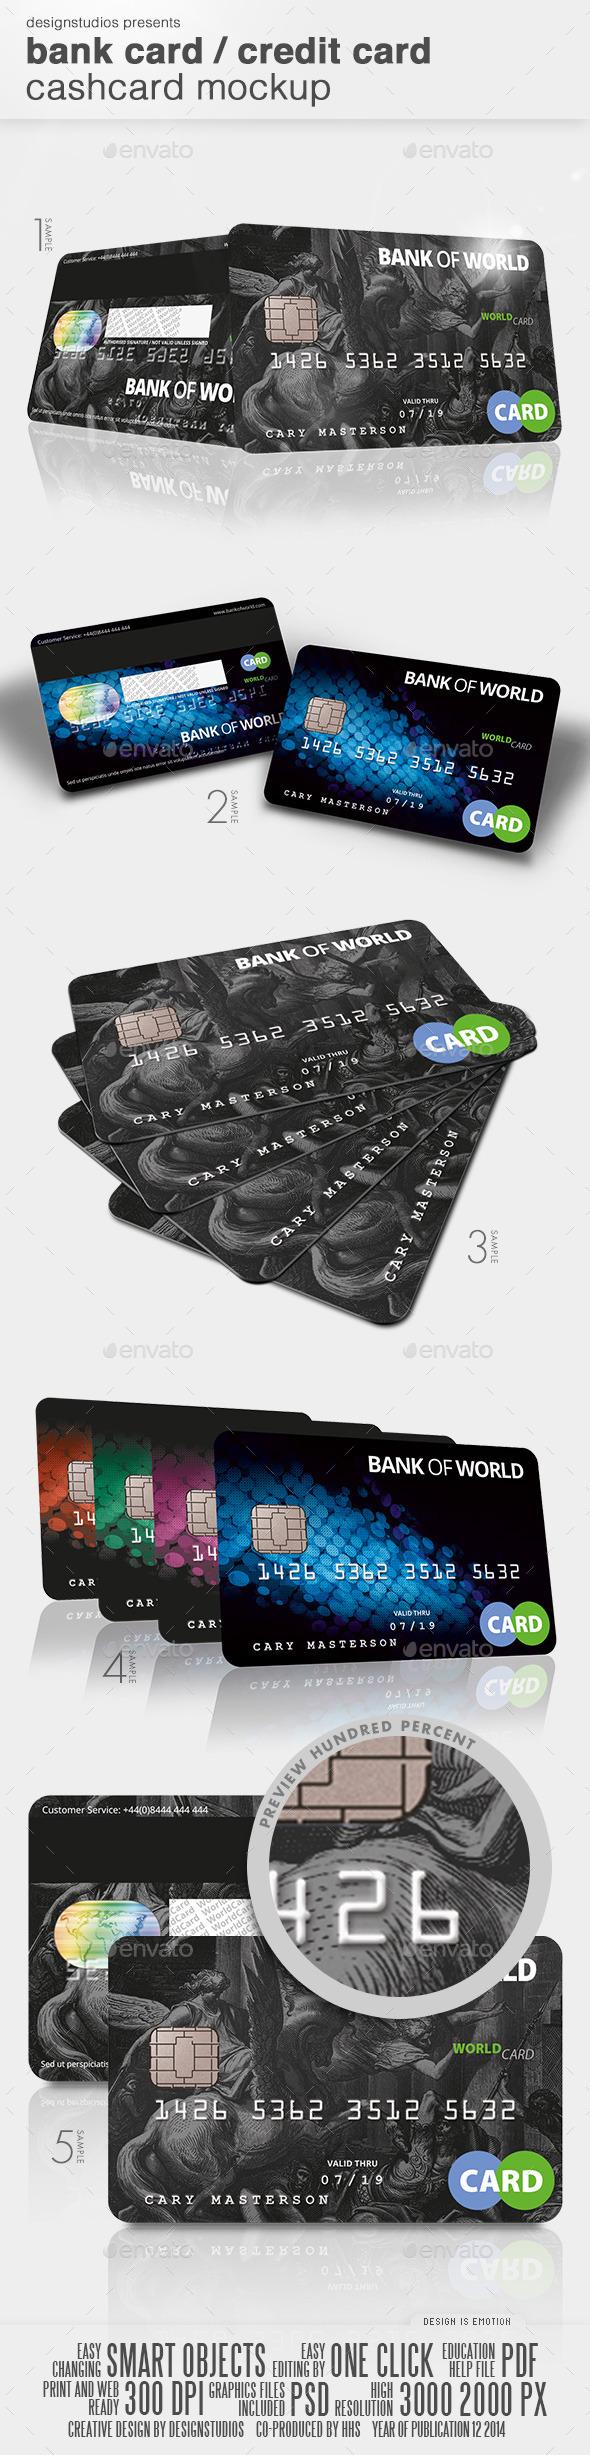 Bank Card / Credit Card CashCard Mock-Up - Product Mock-Ups Graphics